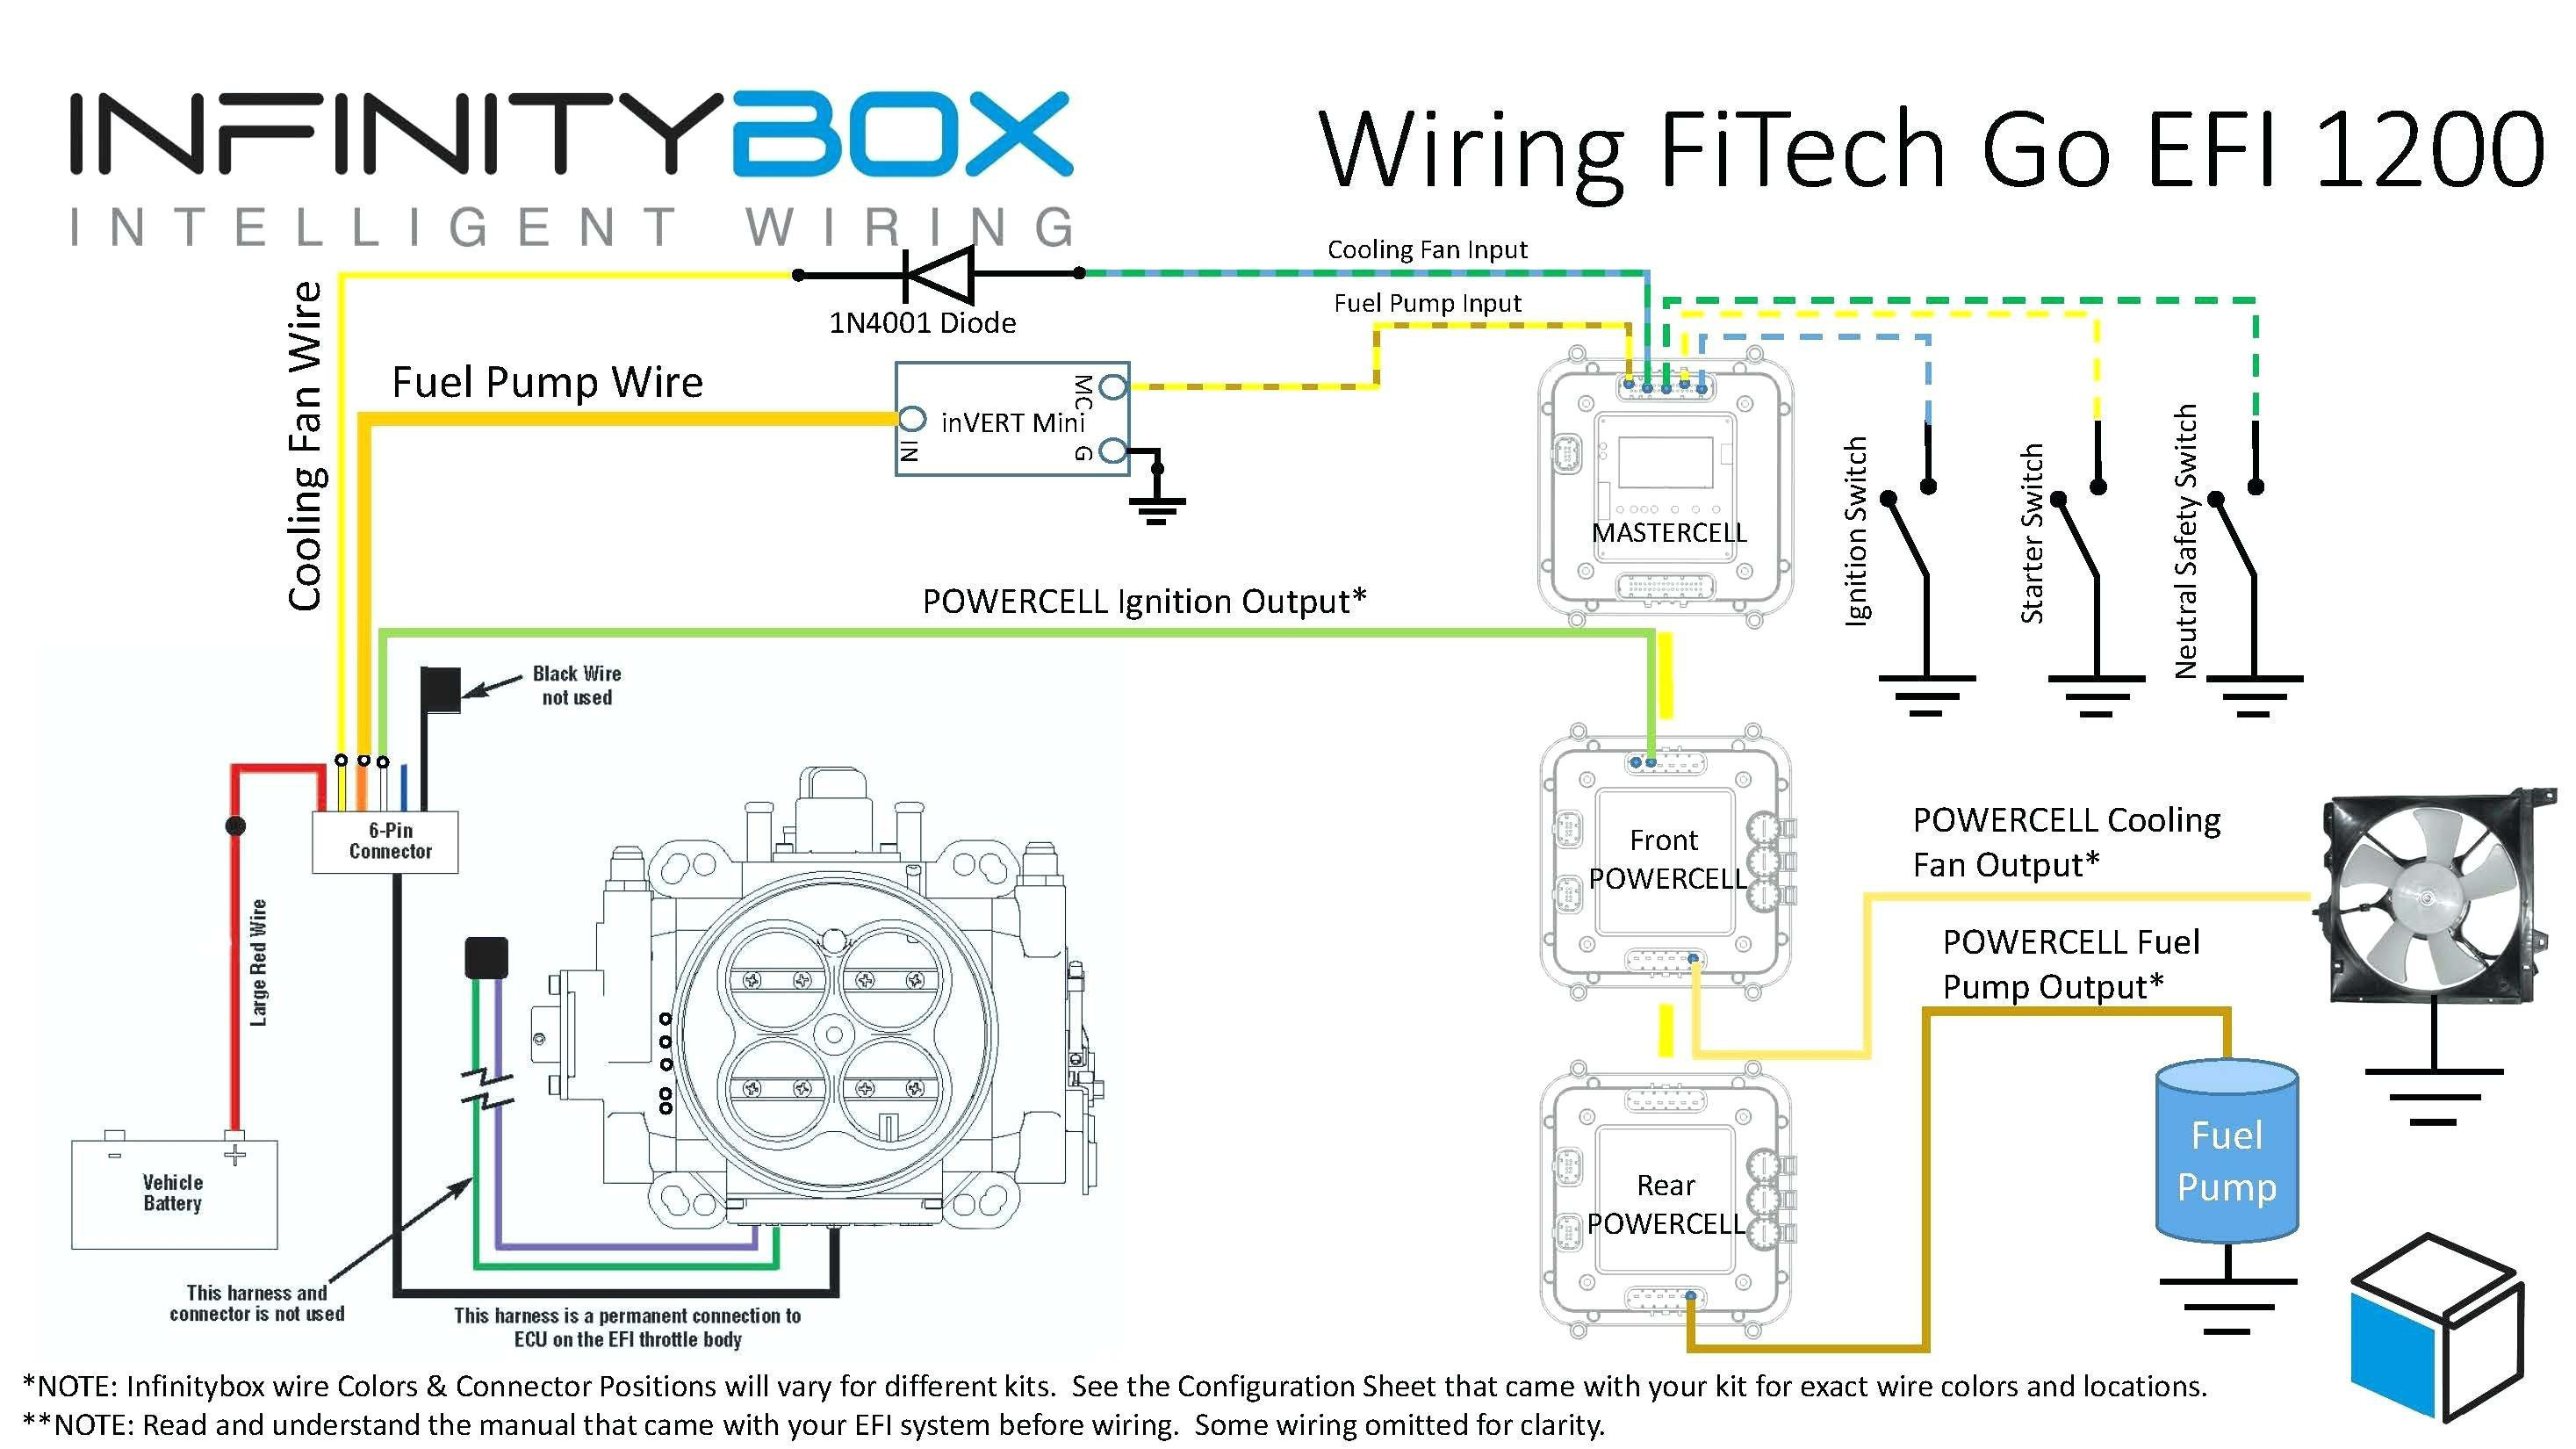 50 Amp Twist Lock Wire Diagram | Wiring Diagram - 50 Amp Twist Lock Plug Wiring Diagram